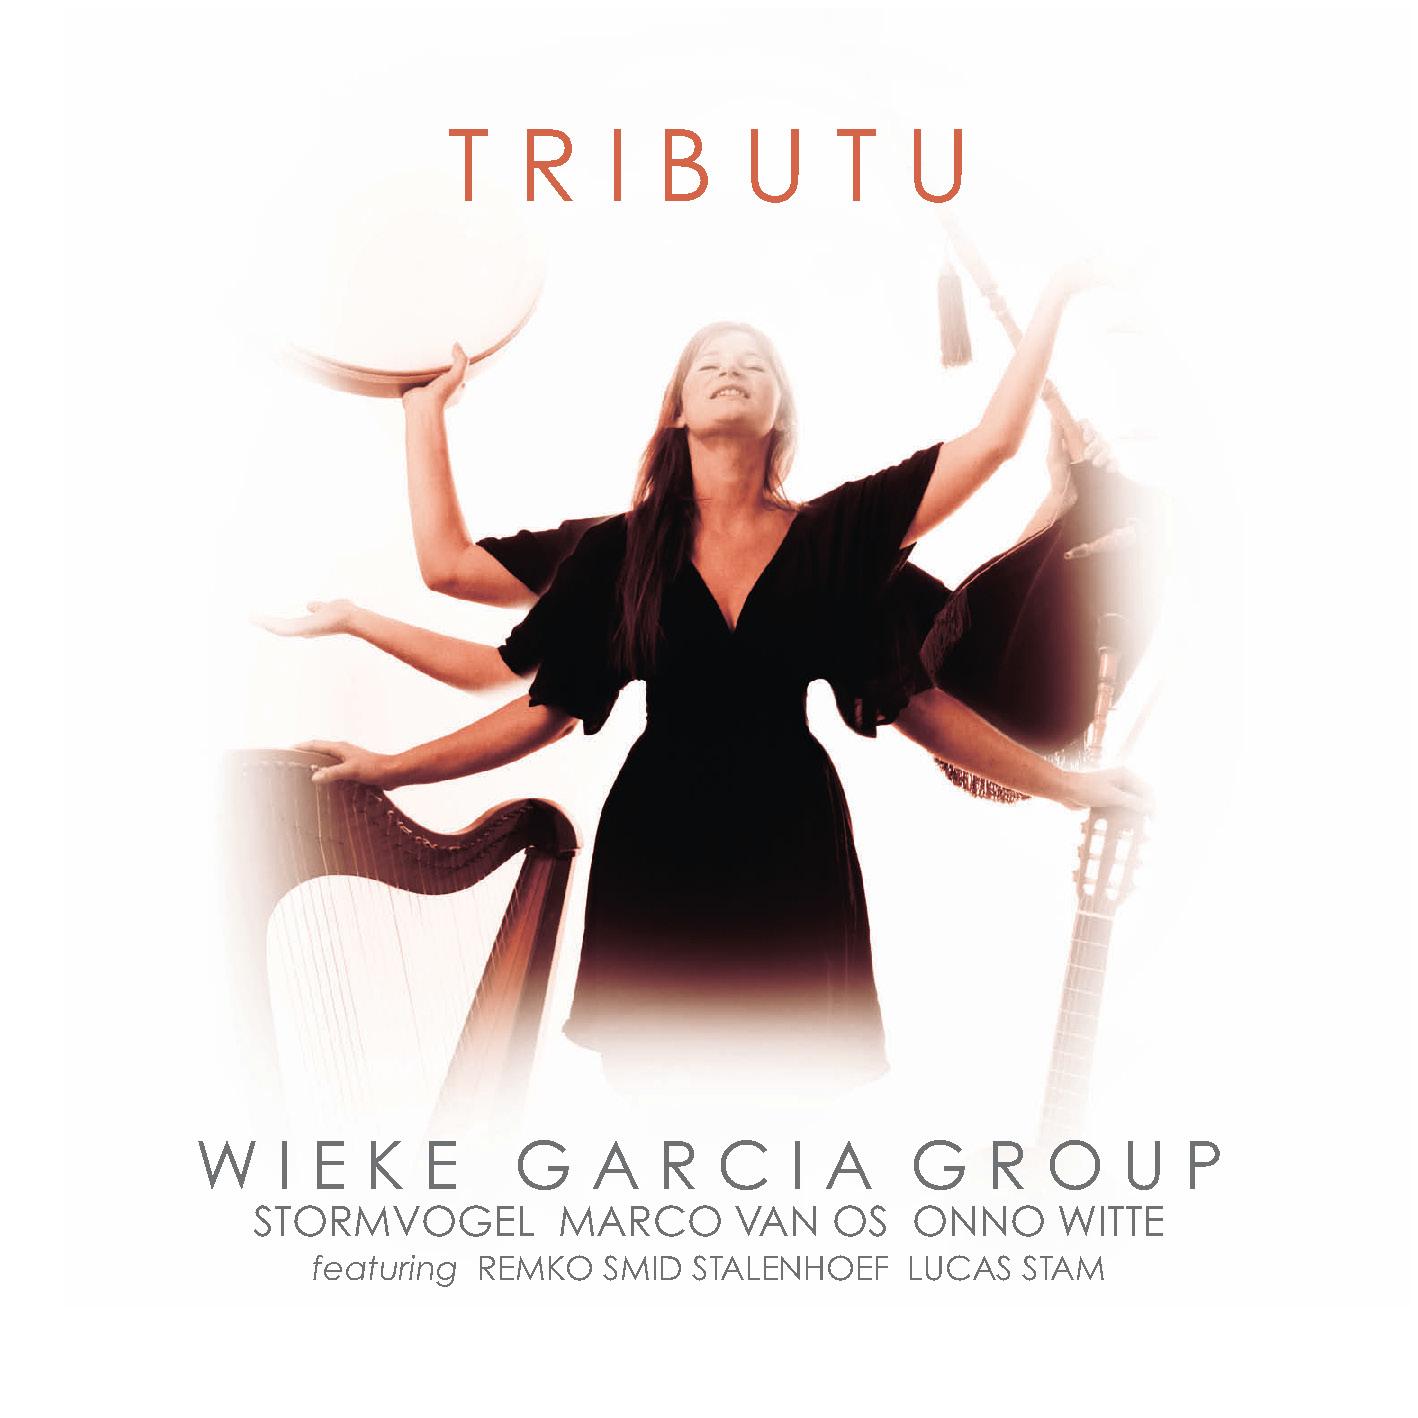 Wieke Garcia